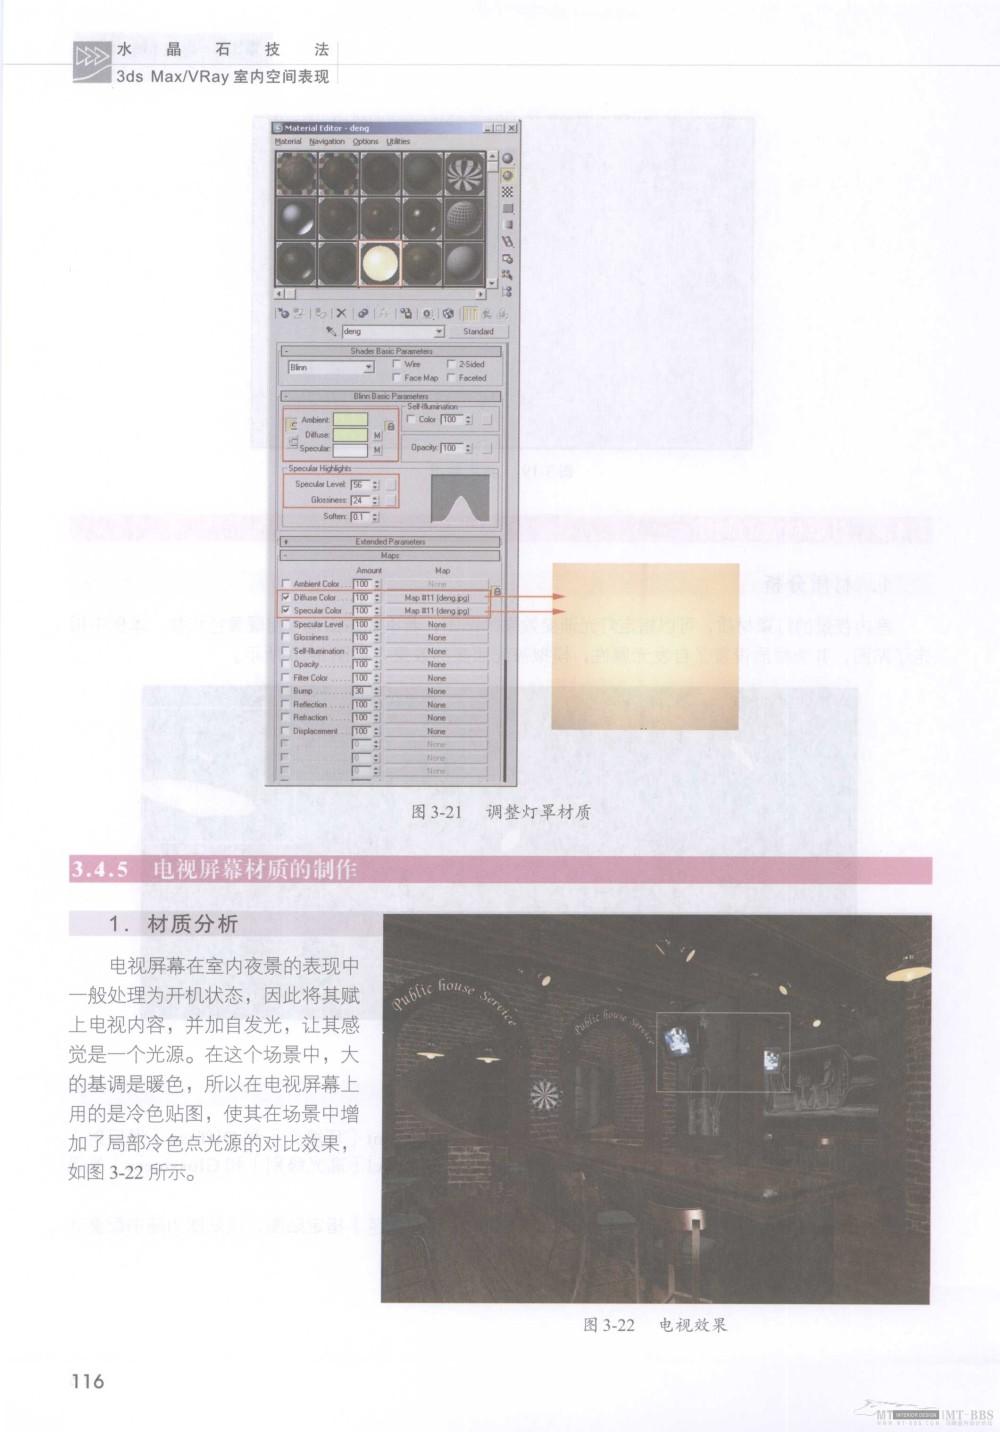 水晶石技法-3ds_Max&VRay室内空间表现_水晶石技法-3ds_Max&VRay室内空间表现_页面_122.jpg